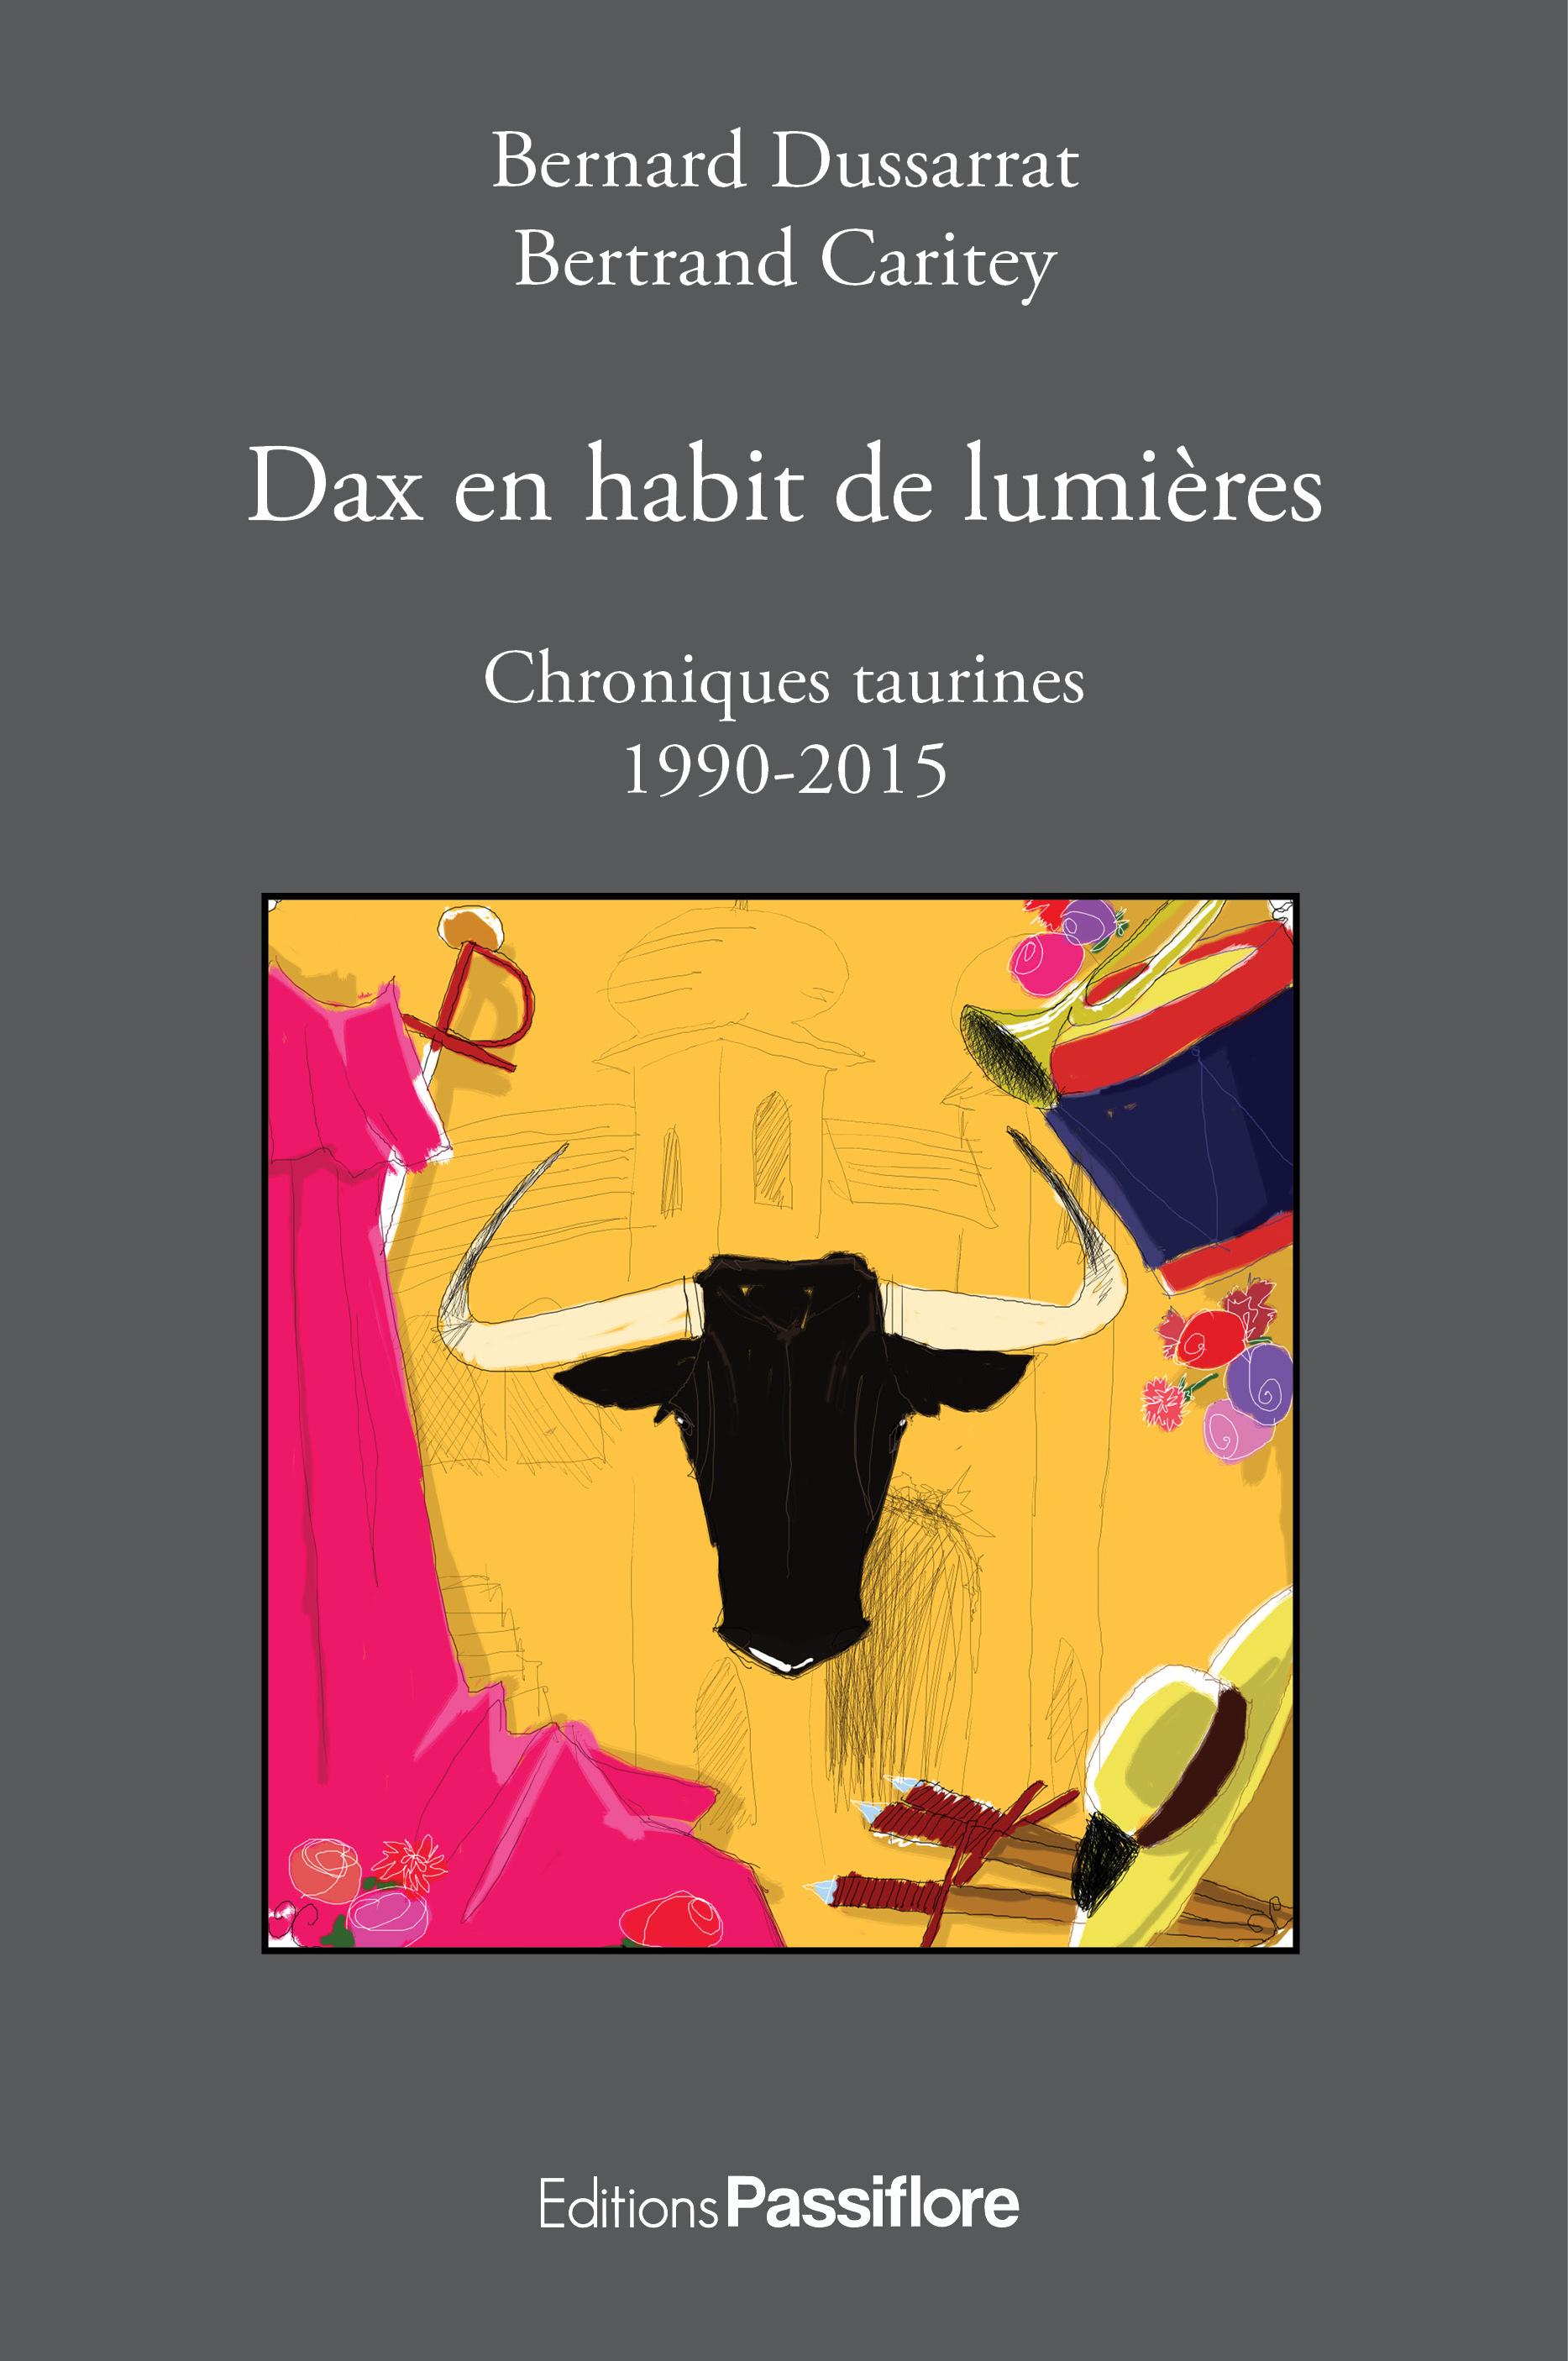 DAX EN HABIT DE LUMIERES